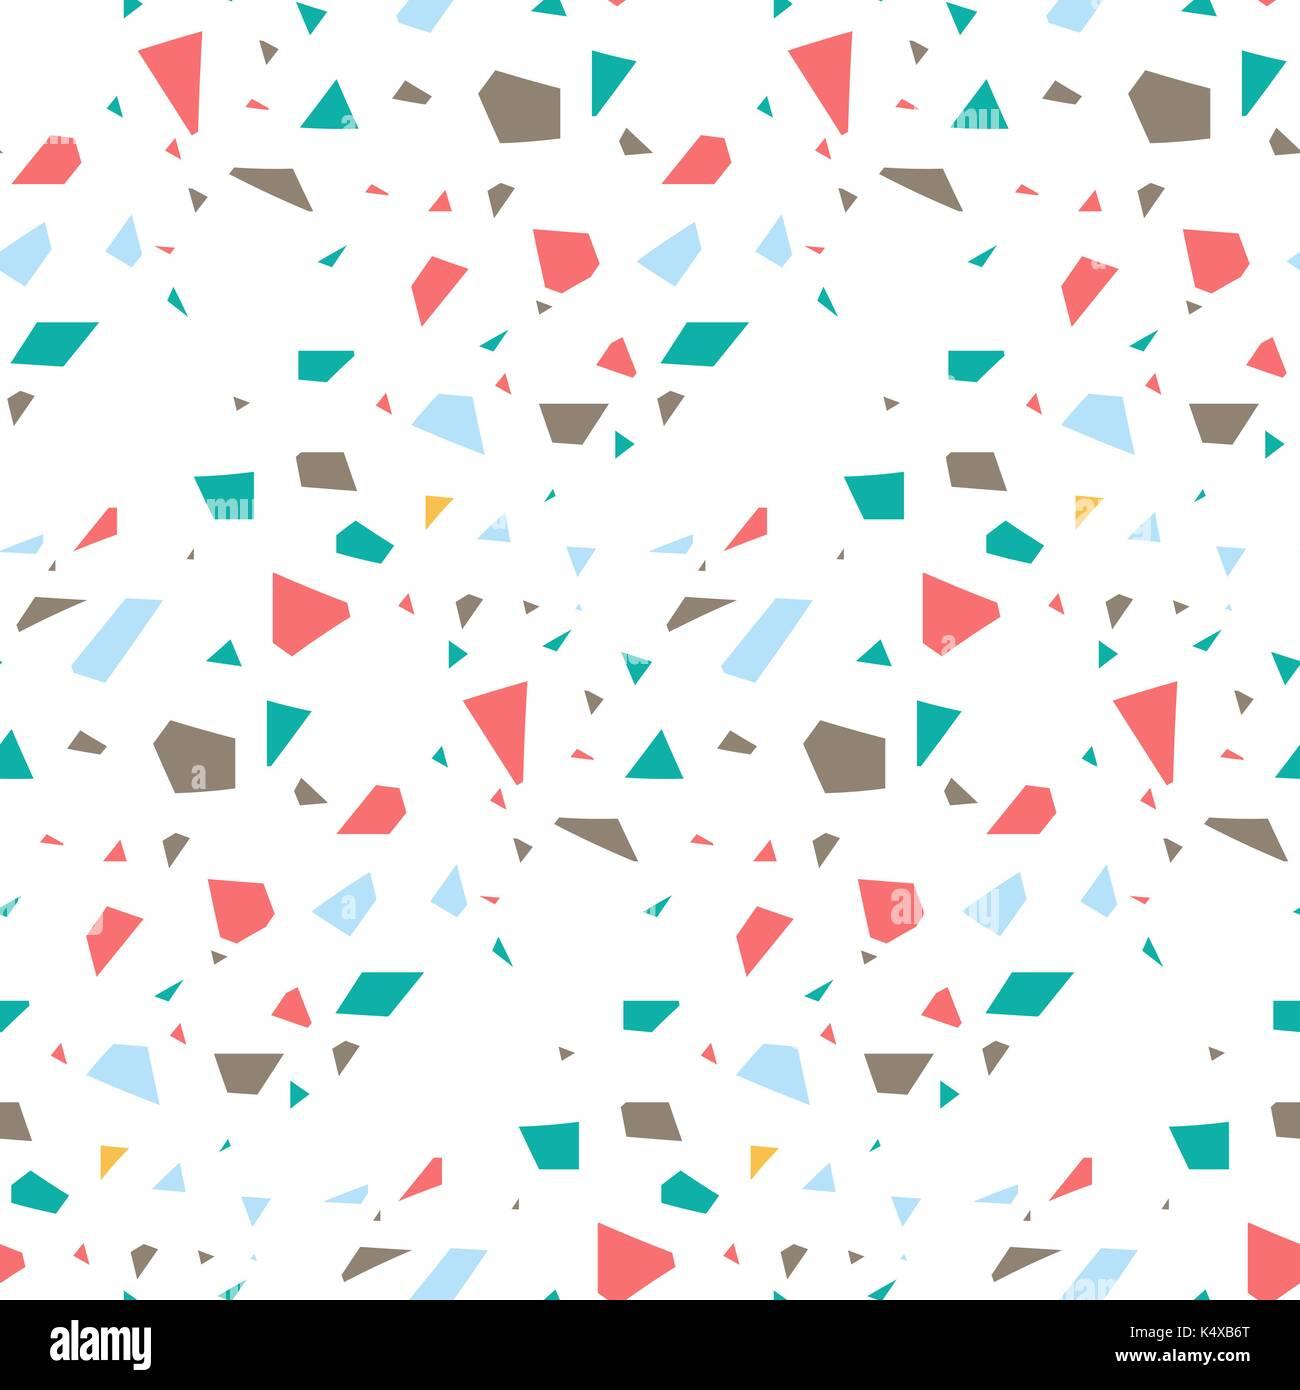 Terrazzo Flooring Seamless Vector Pattern Stock Vector Art